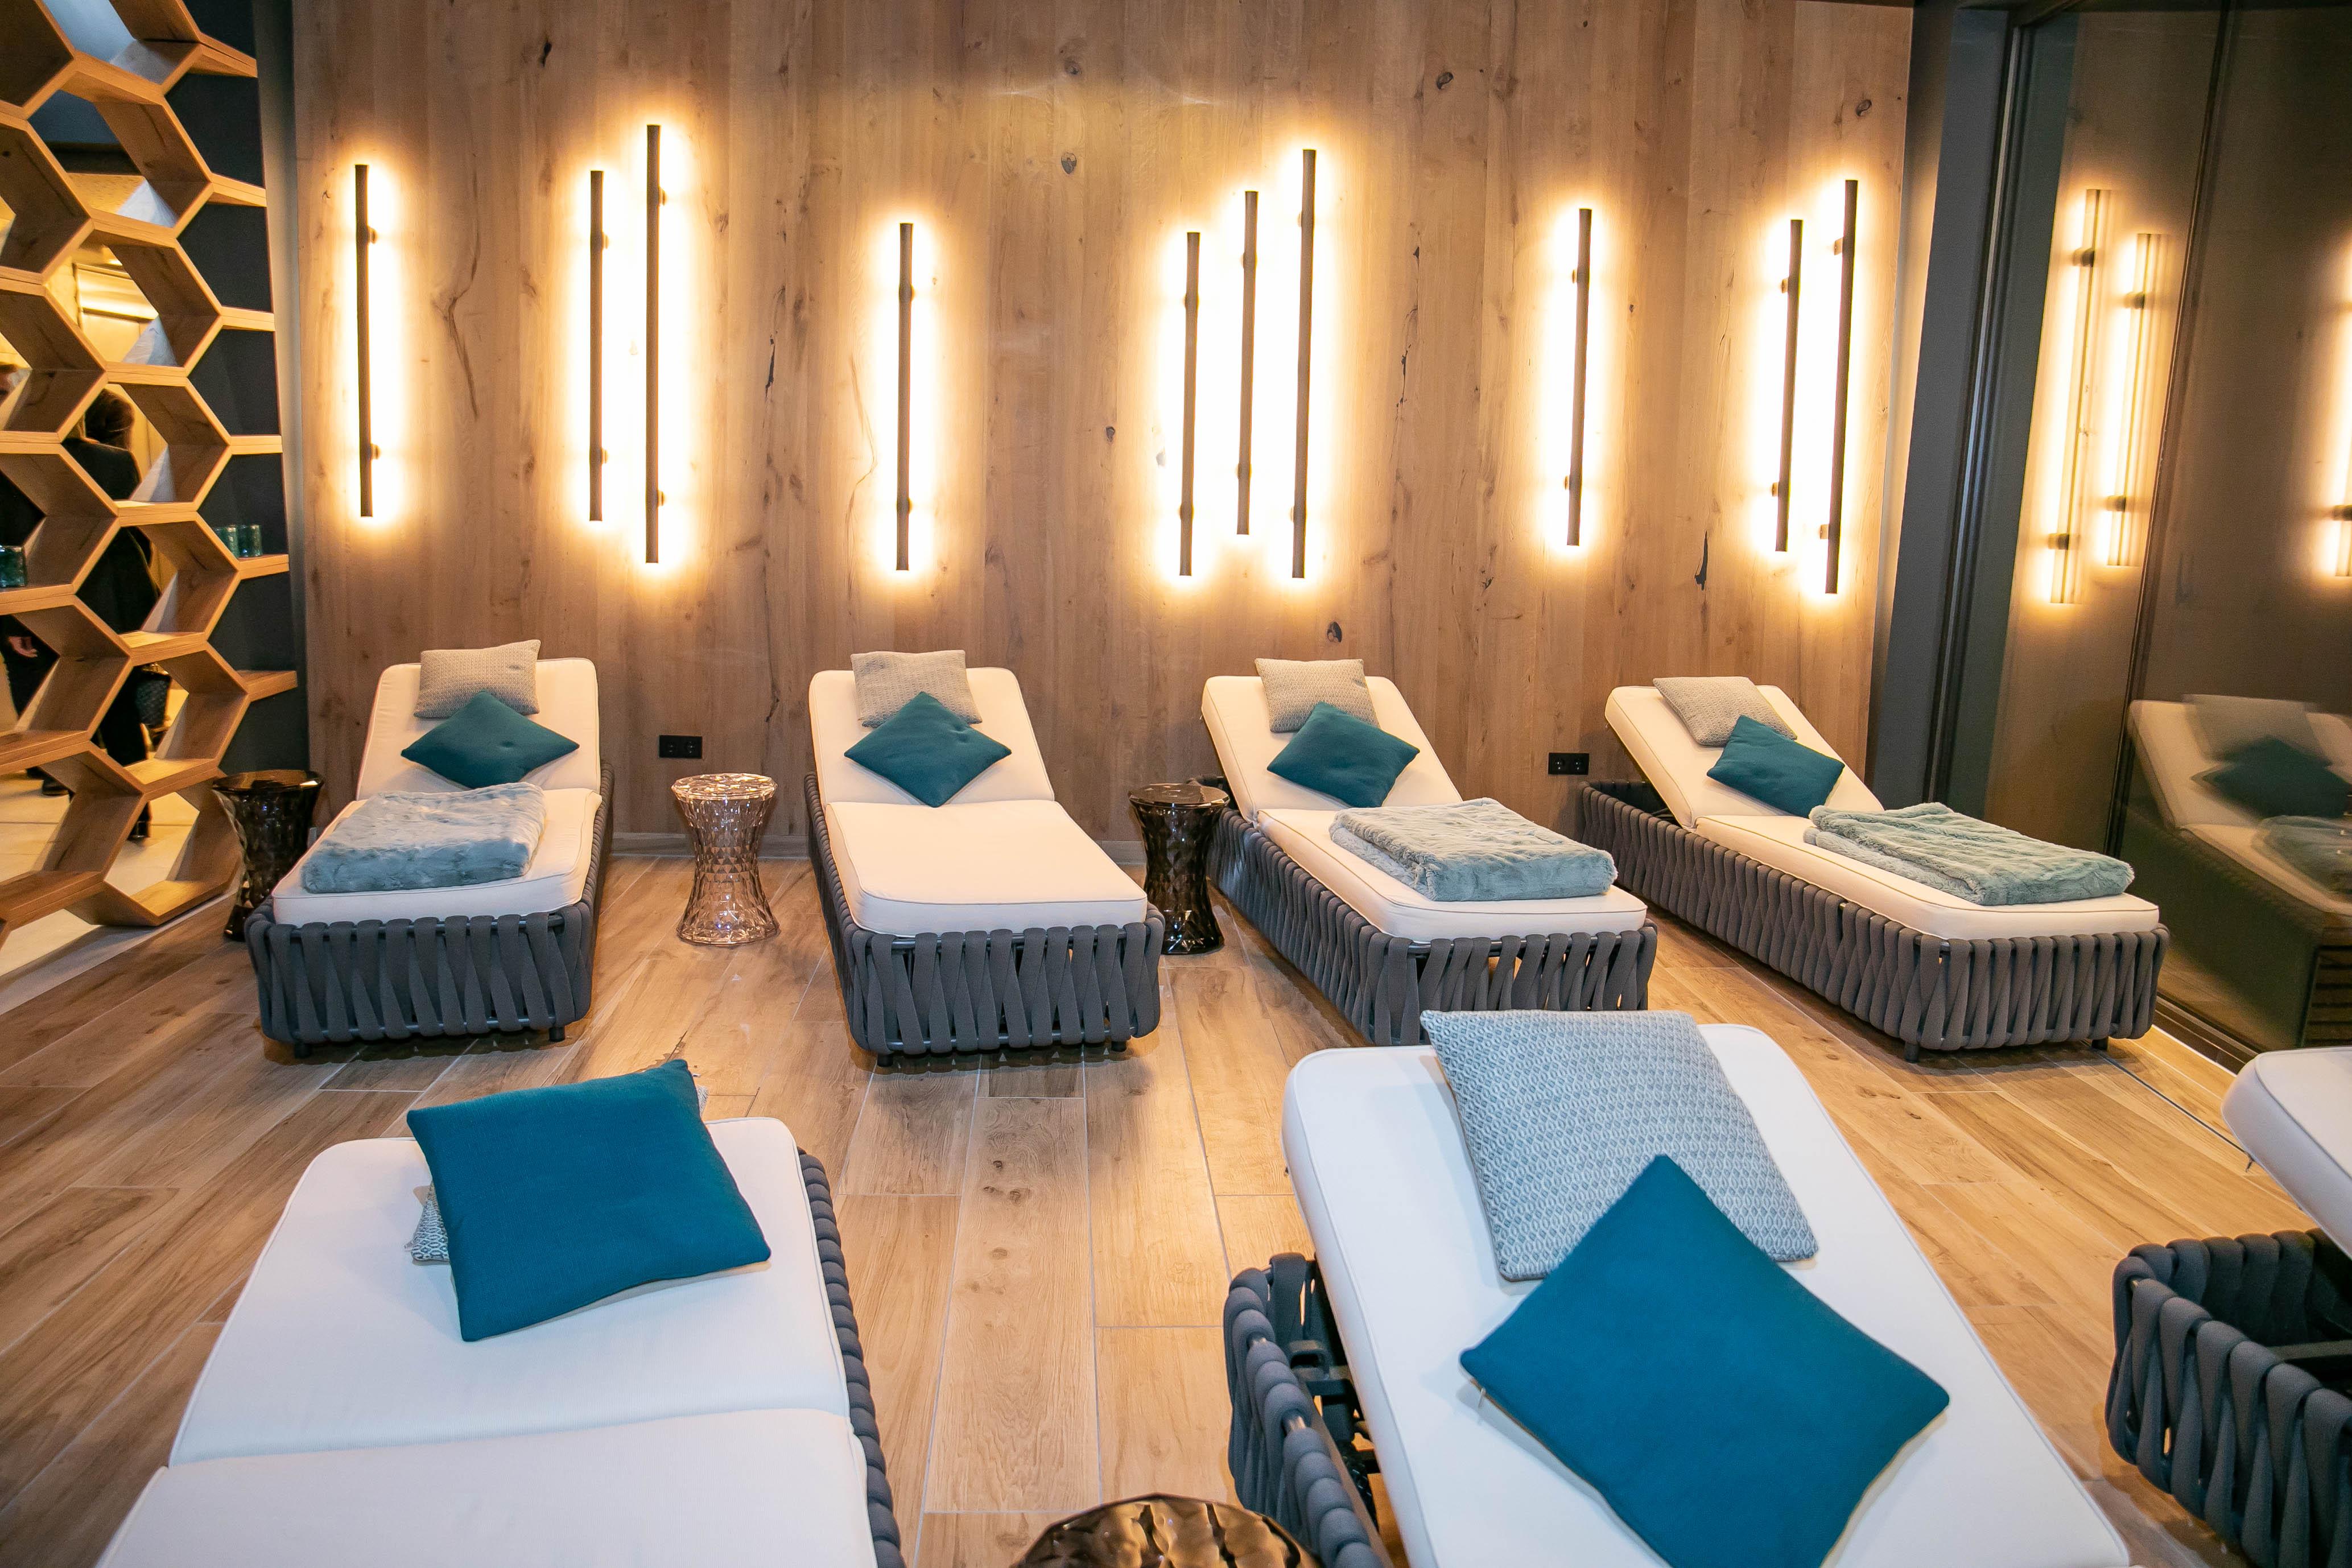 Relaxzone im Hotel Edelweiss in Großarl ©www.wildbild.at